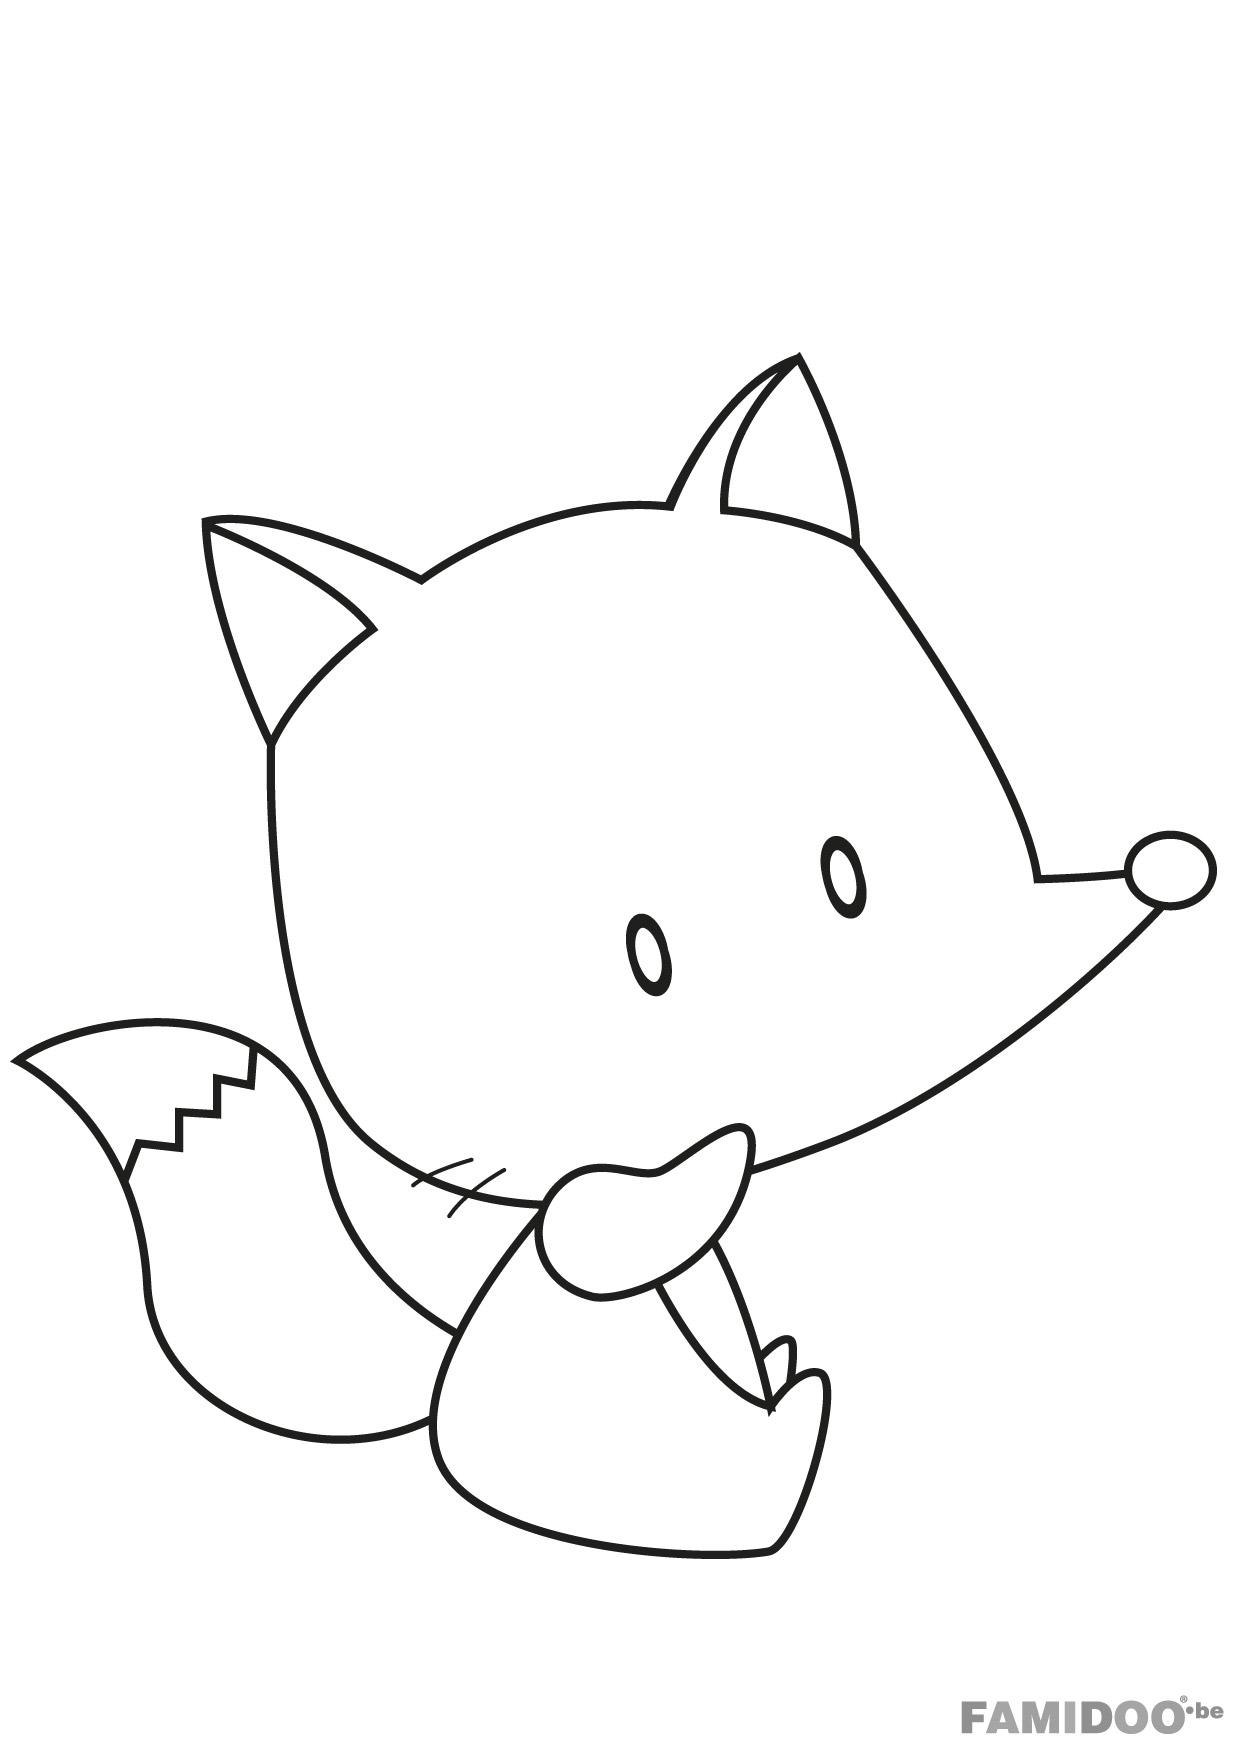 dessin � colorier renard assis